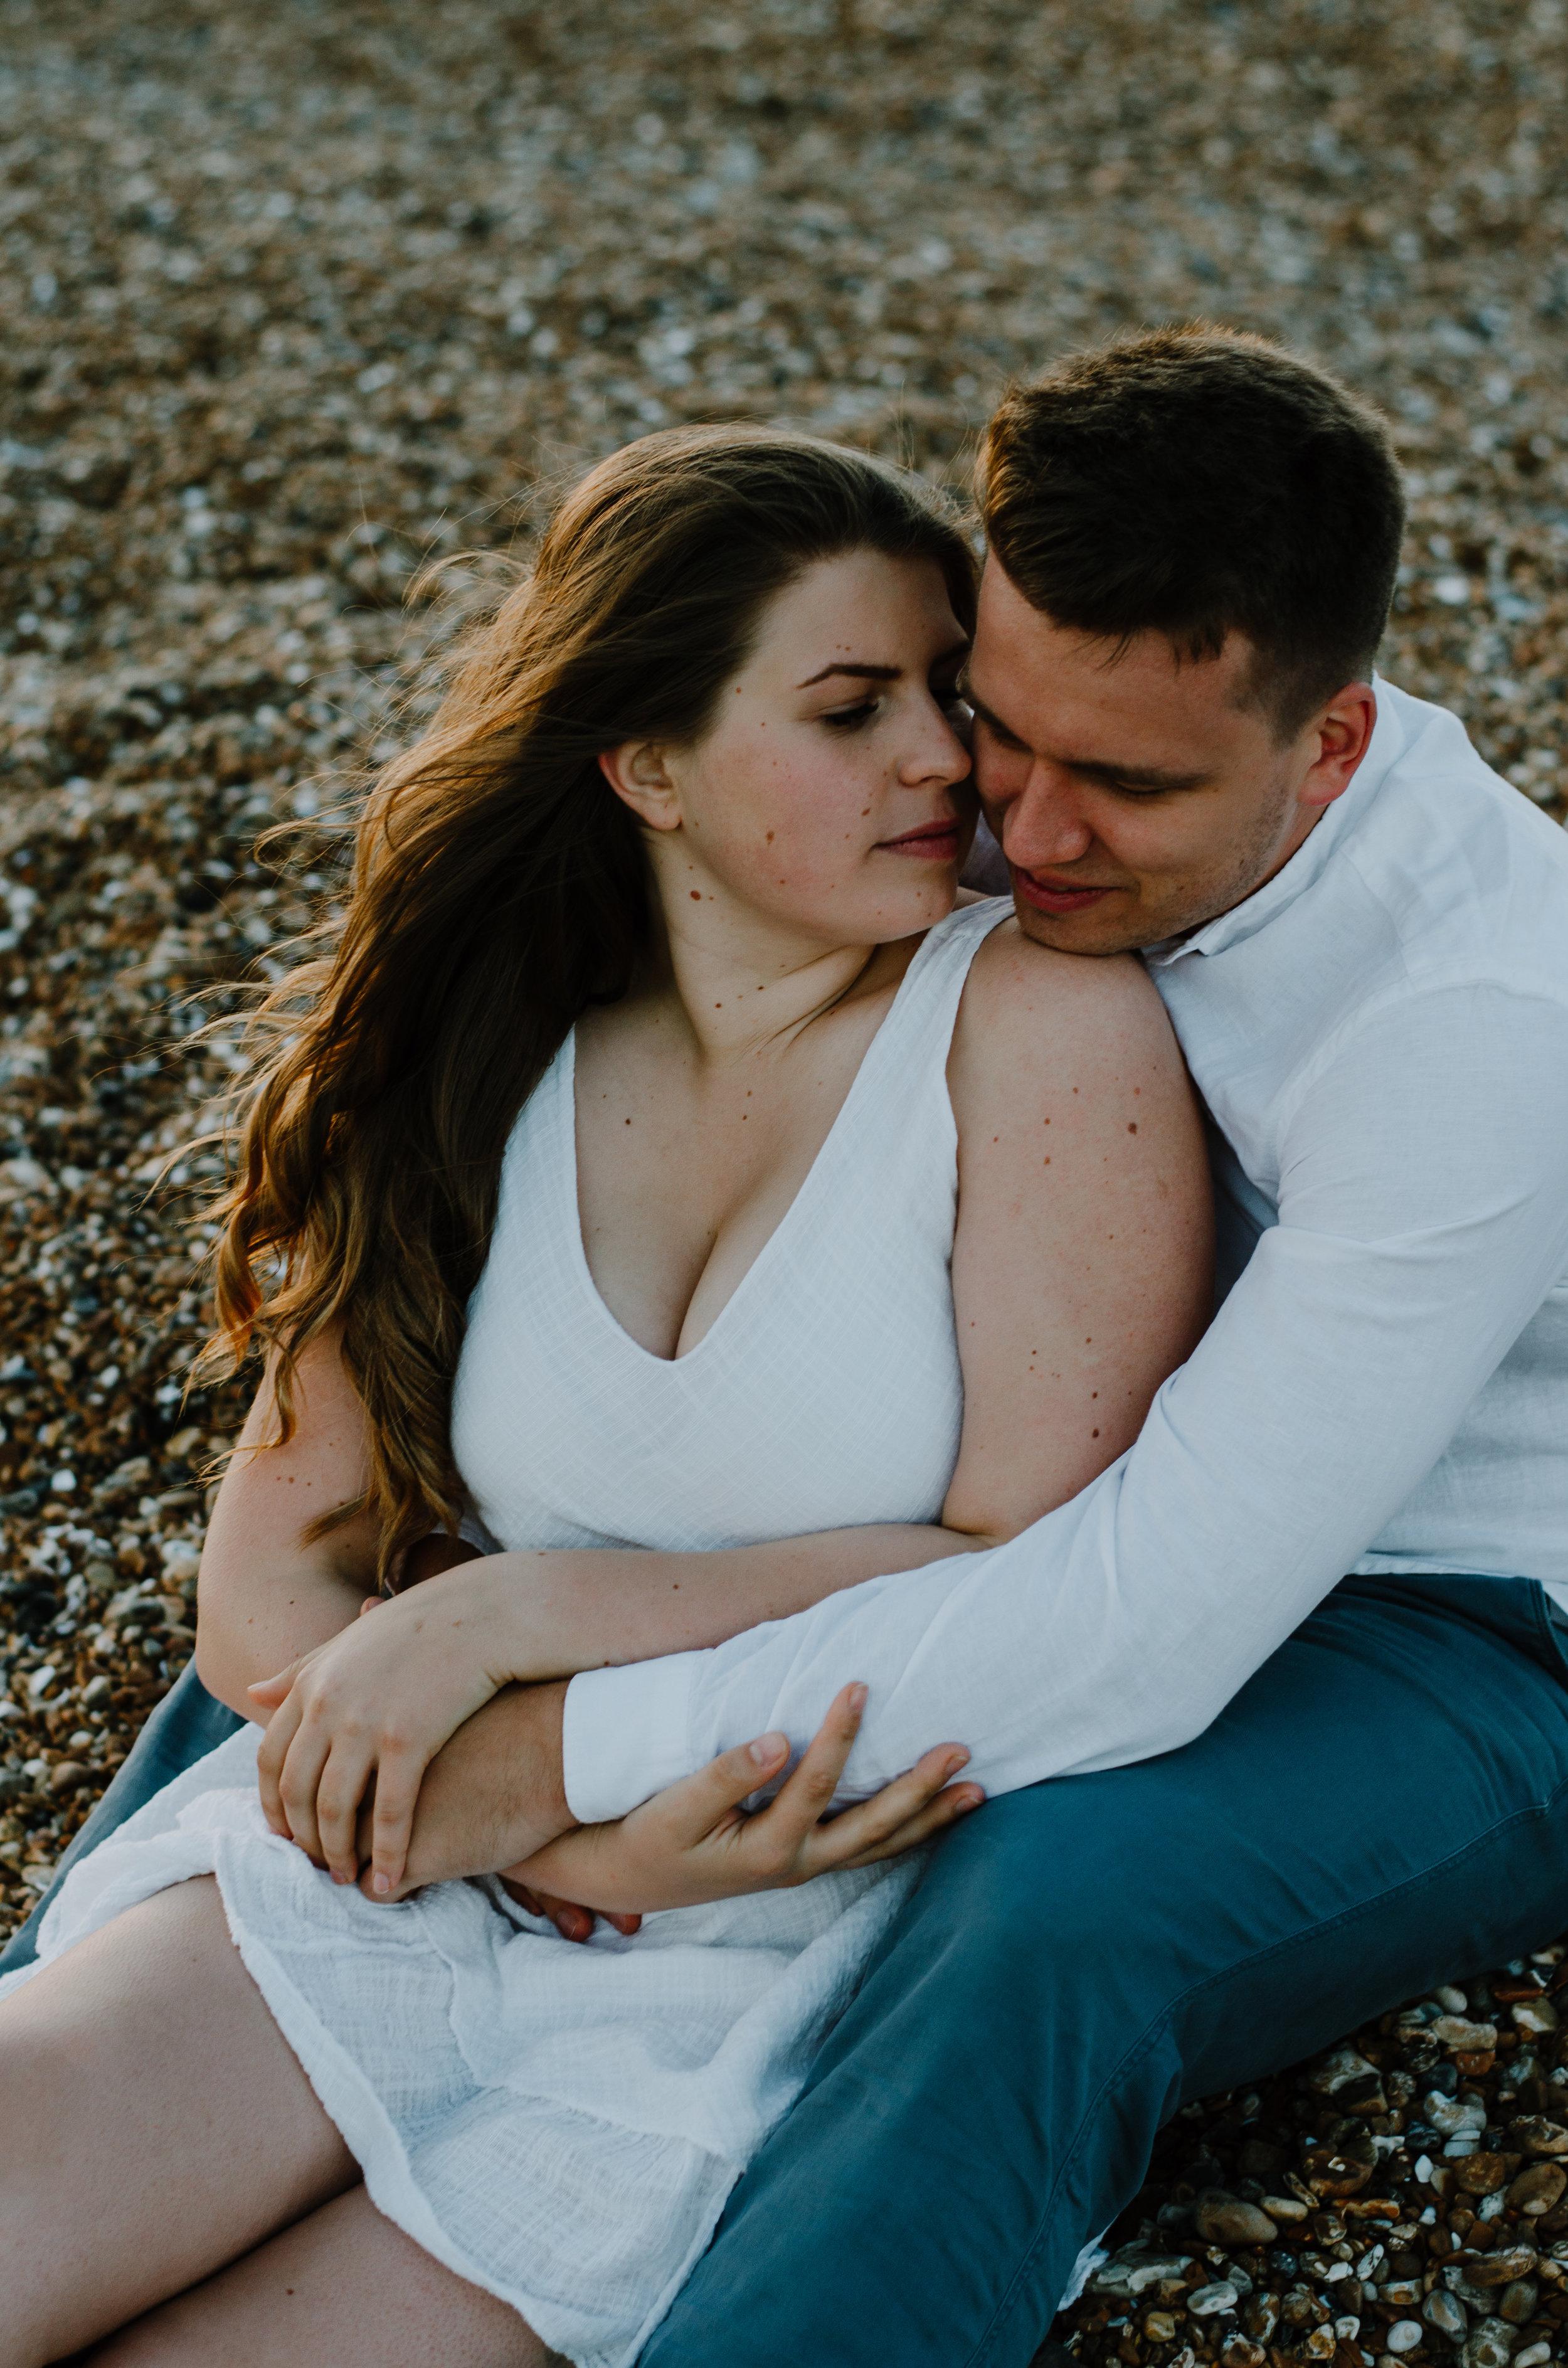 Ieva & Julius - Brighton Beach - Couple Session - Aiste Saulyte Photography-49.jpg